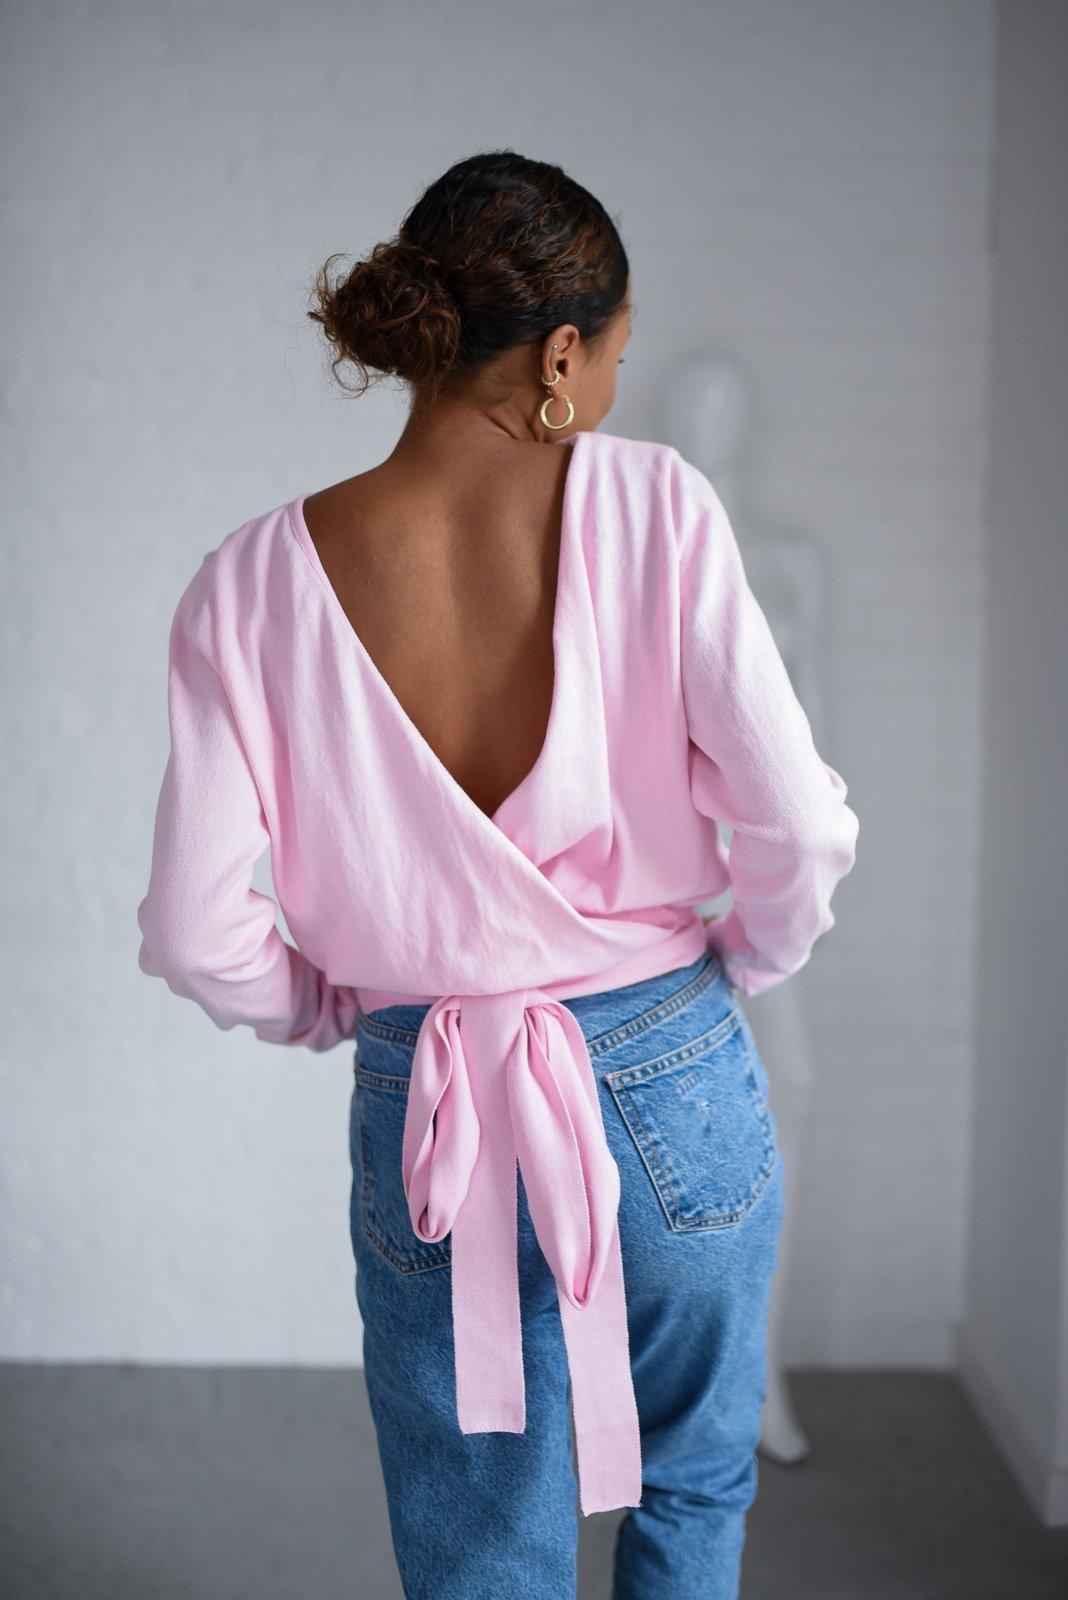 CHEAP Malibu Barbi Sweater 28617024001 – Women's Tops